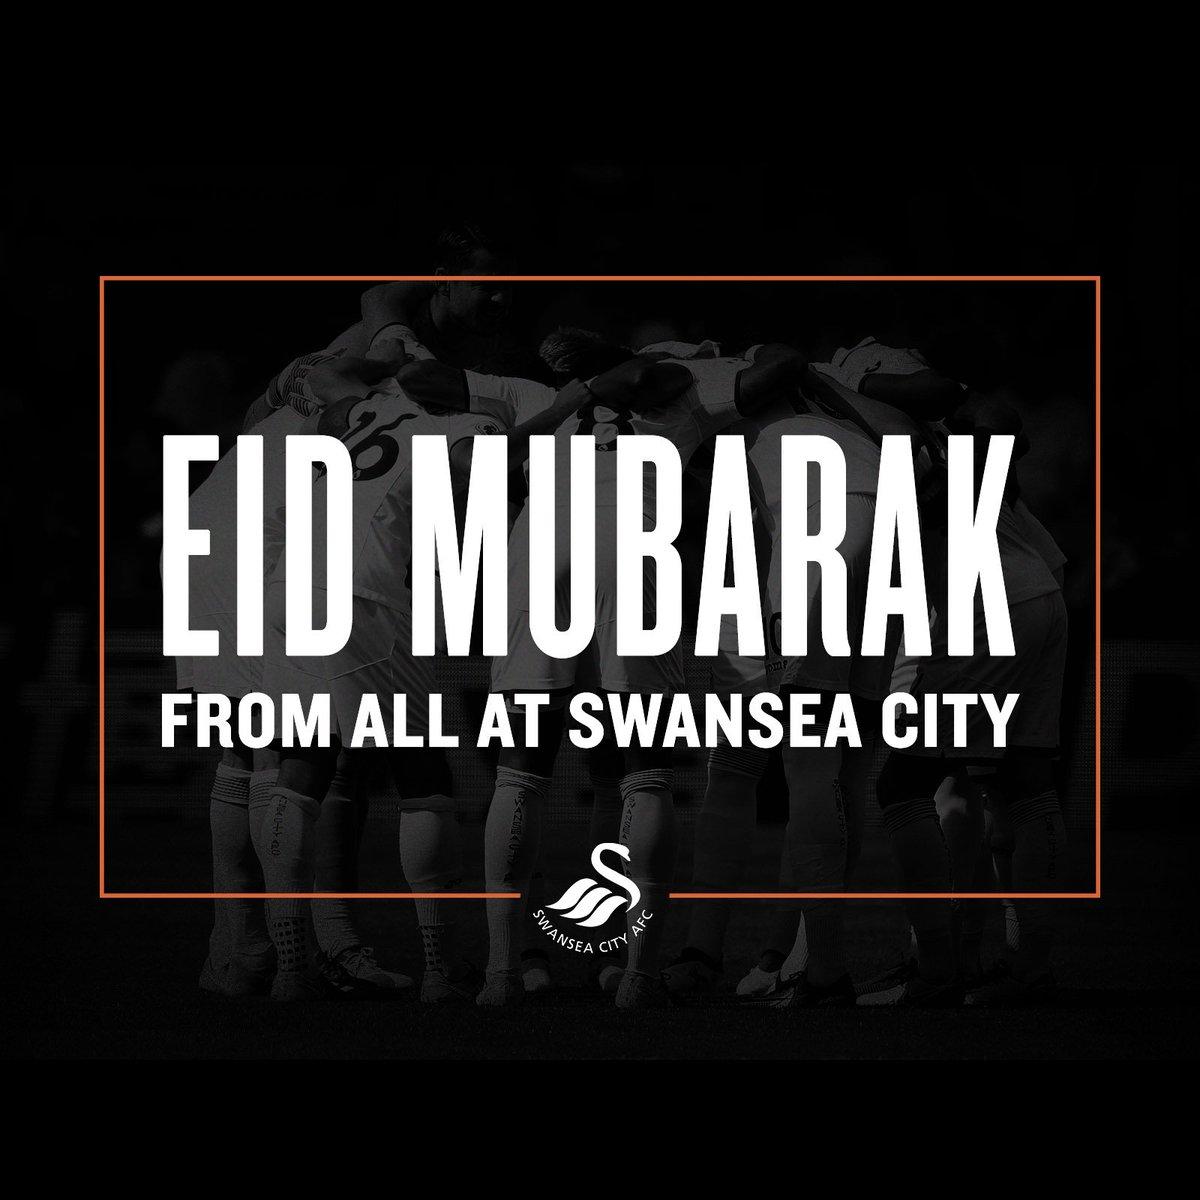 Eid Mubarak to all of our supporters celebrating around the world! #EidMubarak